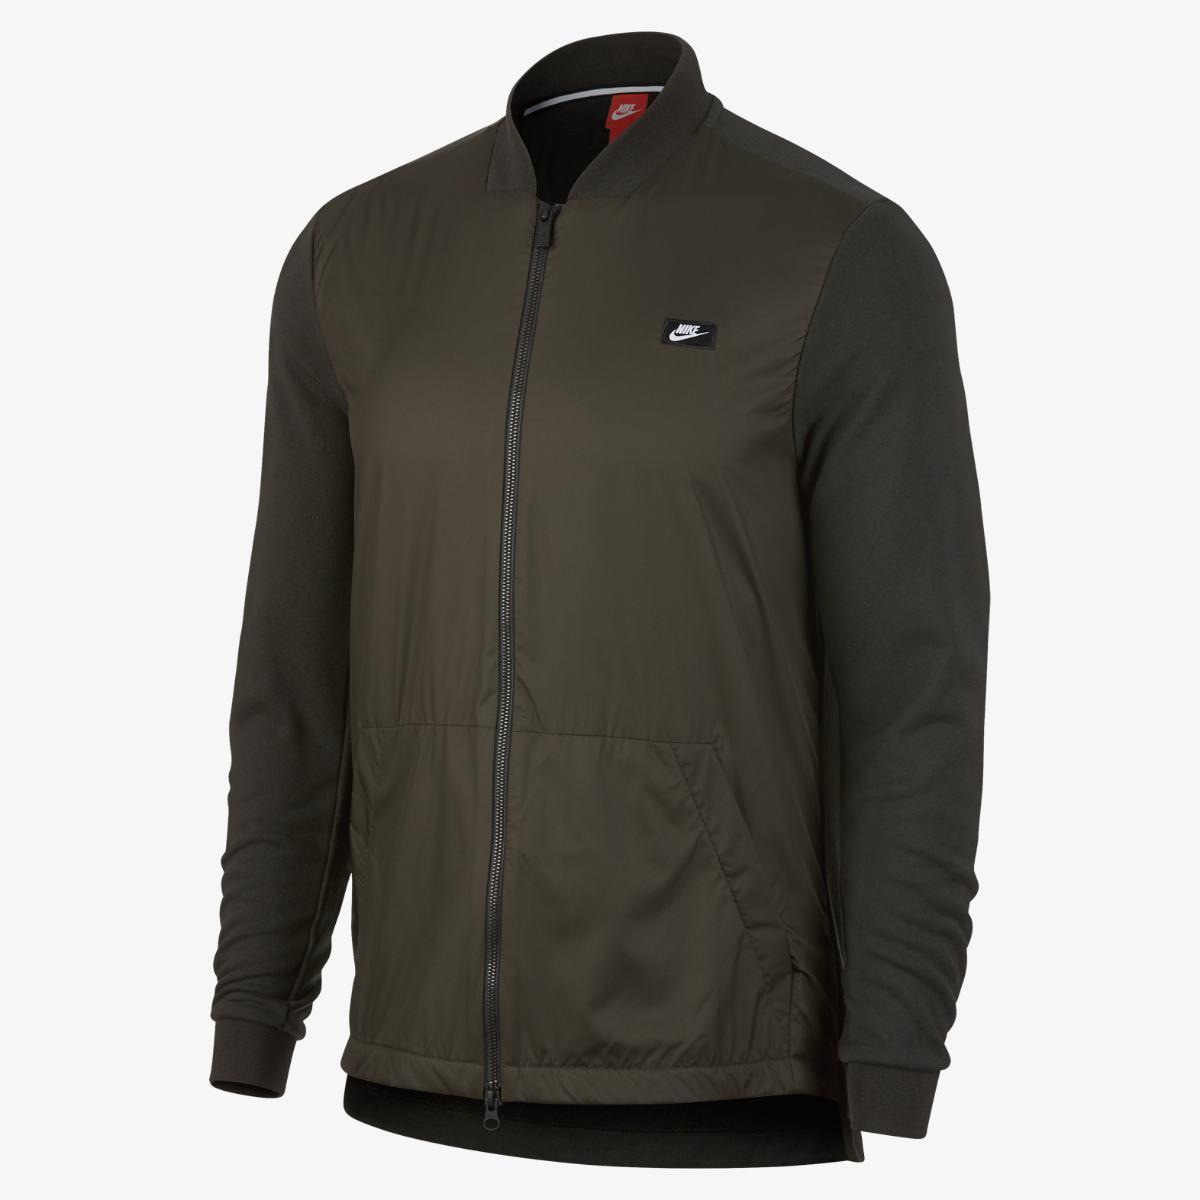 f43d8407 Купить Мужская куртка NIKE NSW Modern Top (Артикул: 886245-355) в ...